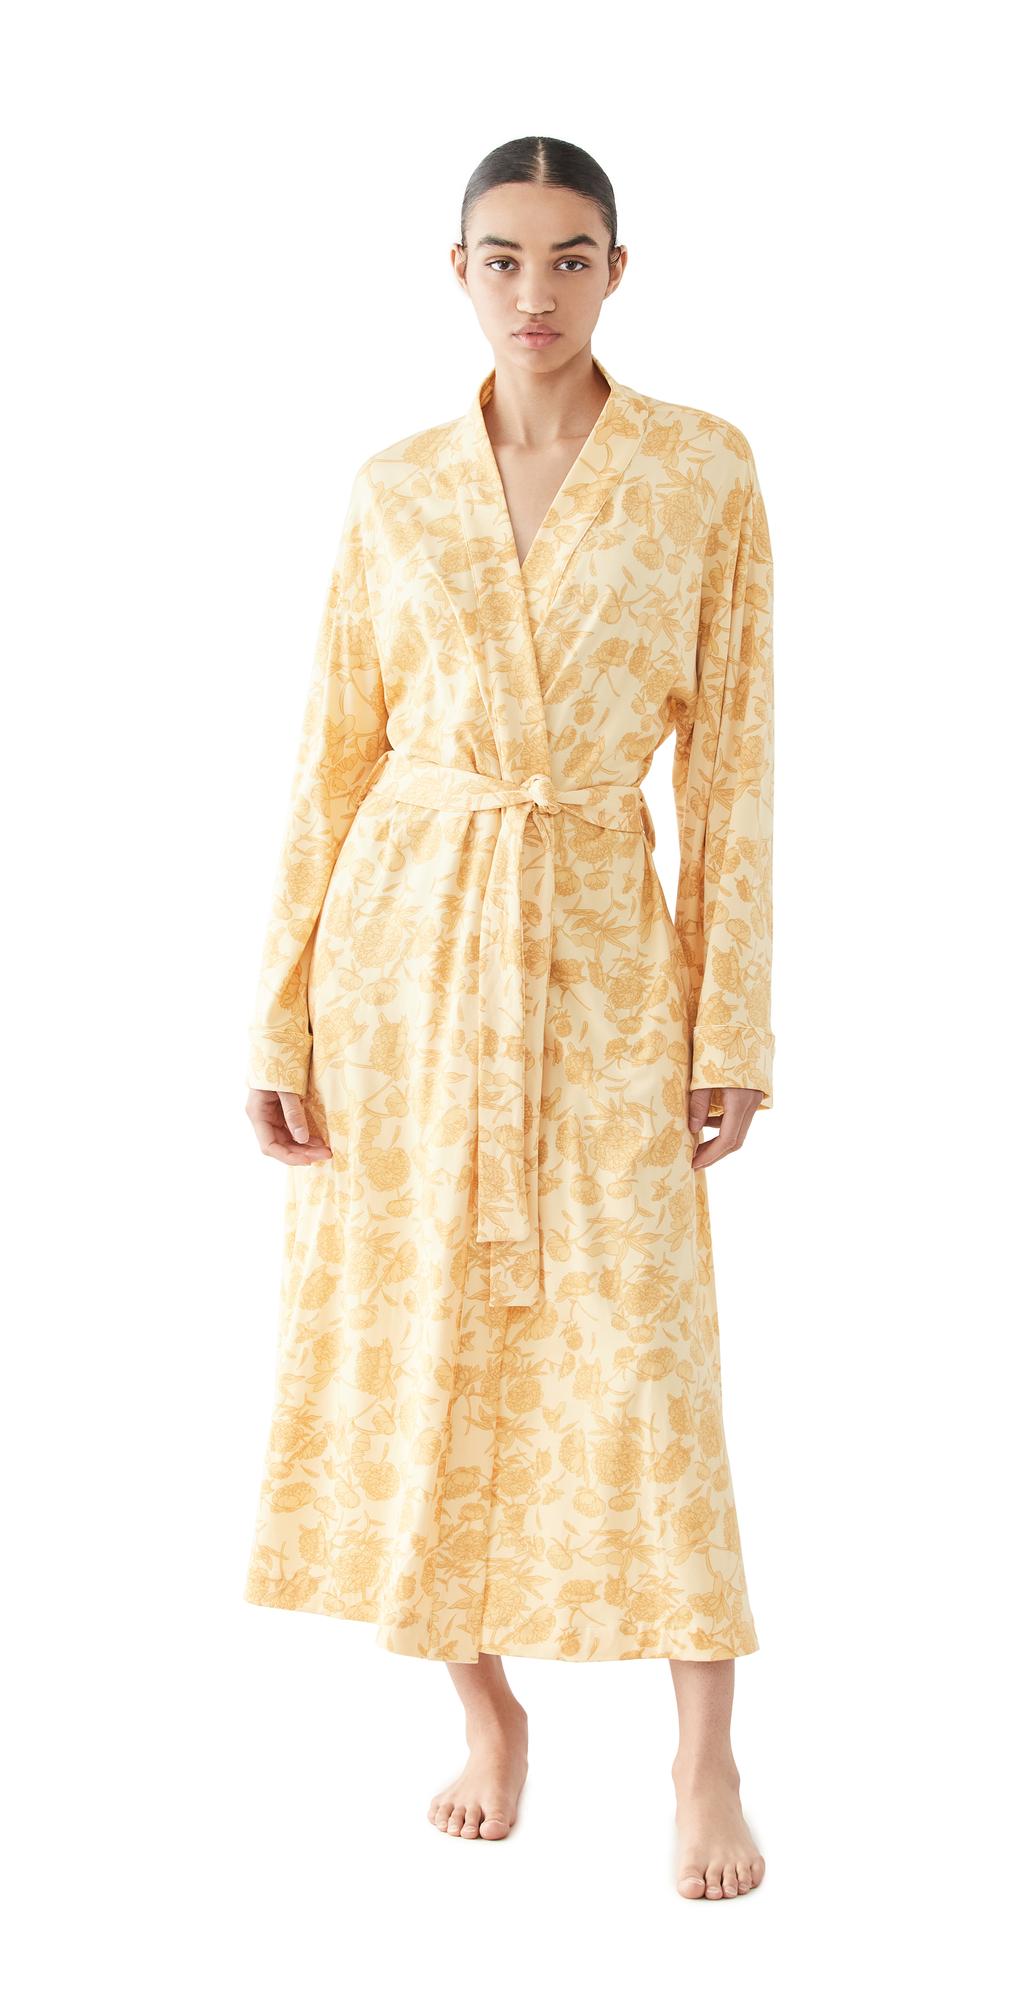 Golden Cheetah Kimono